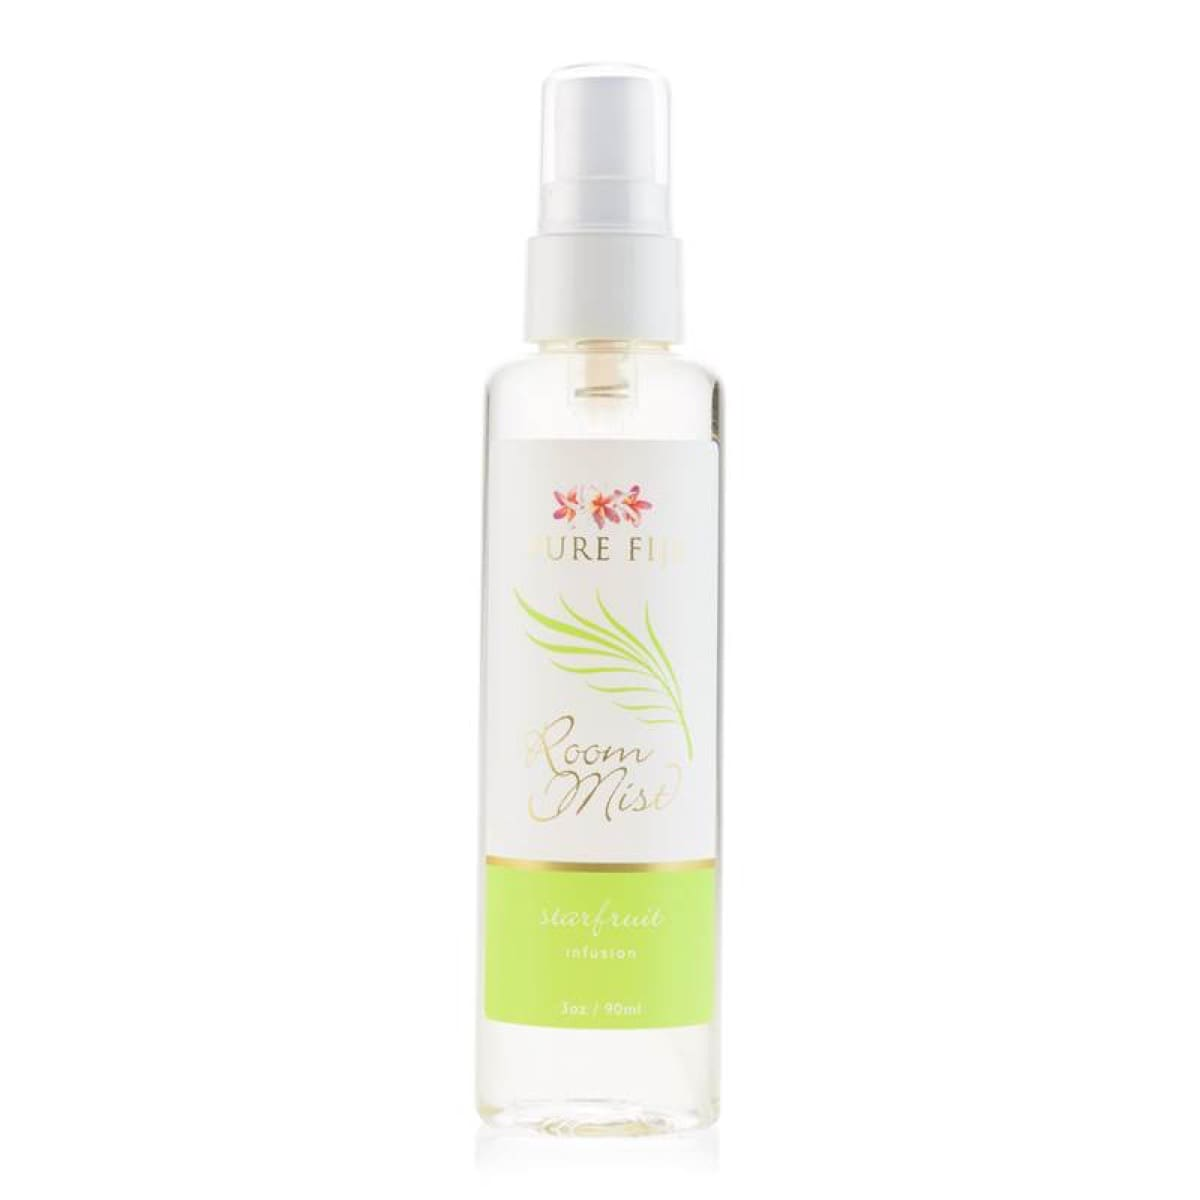 Fragrance 2 purefiji